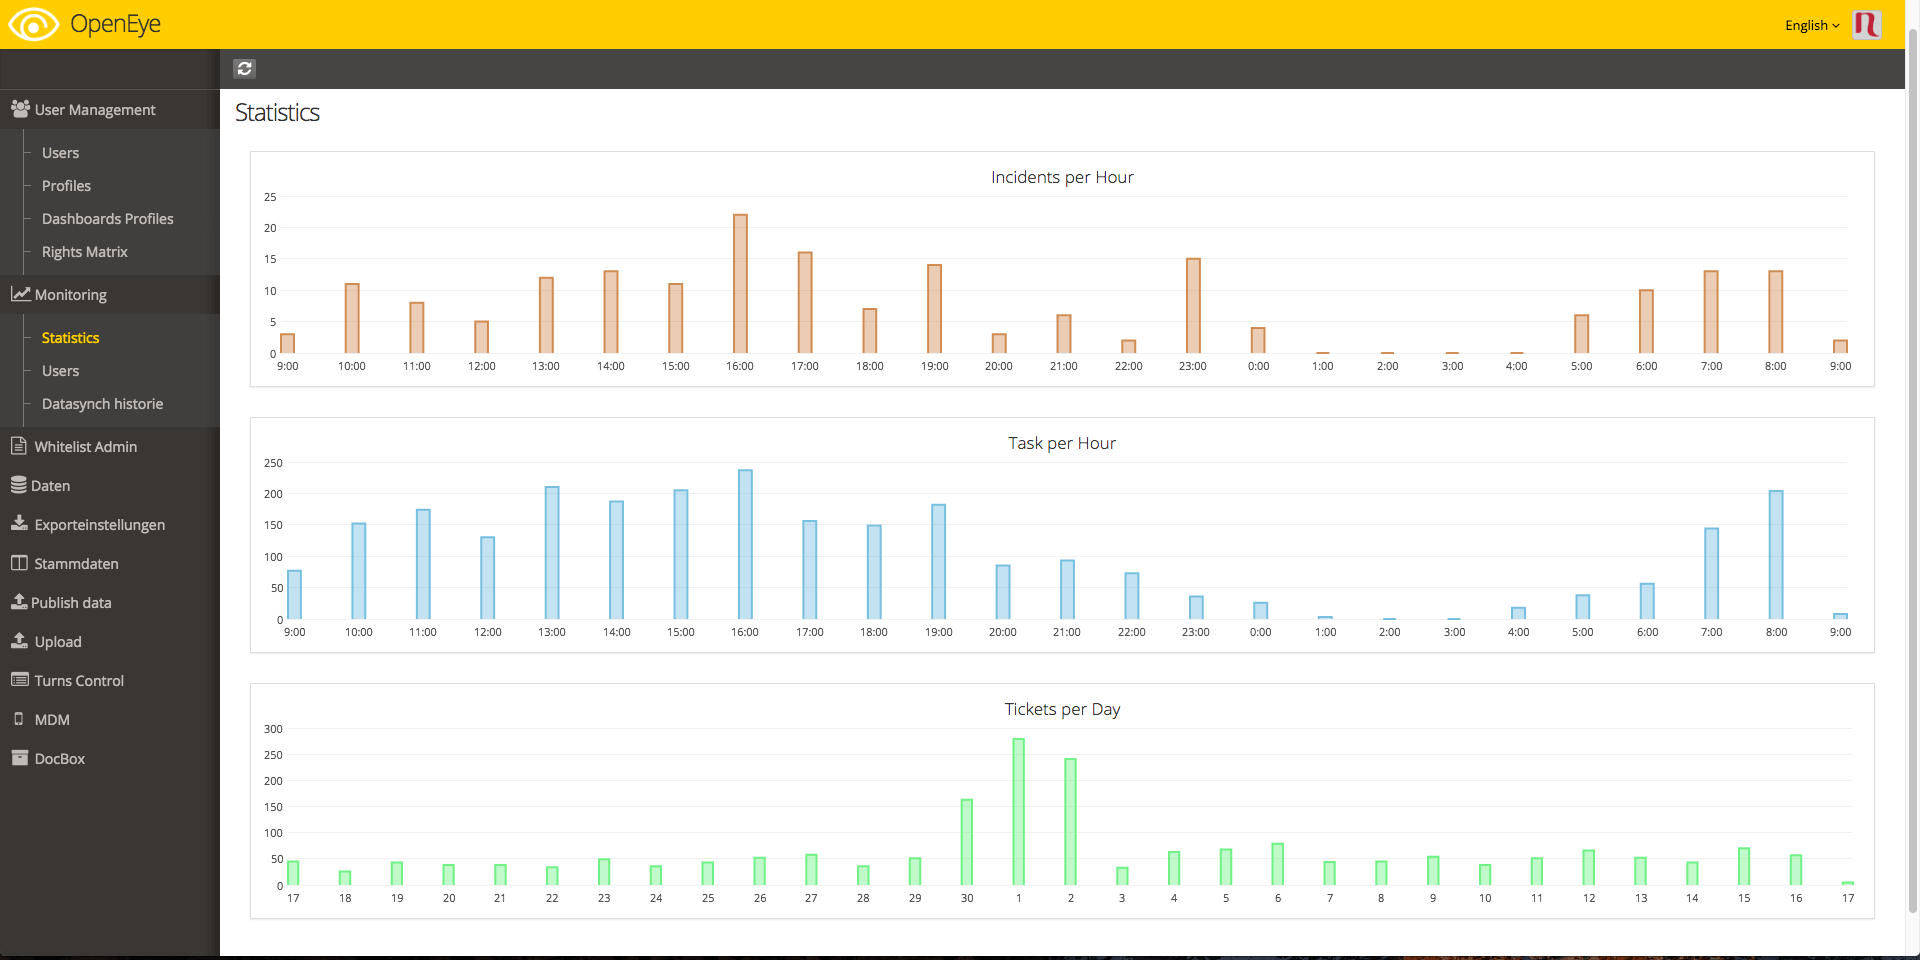 1 - Statistics